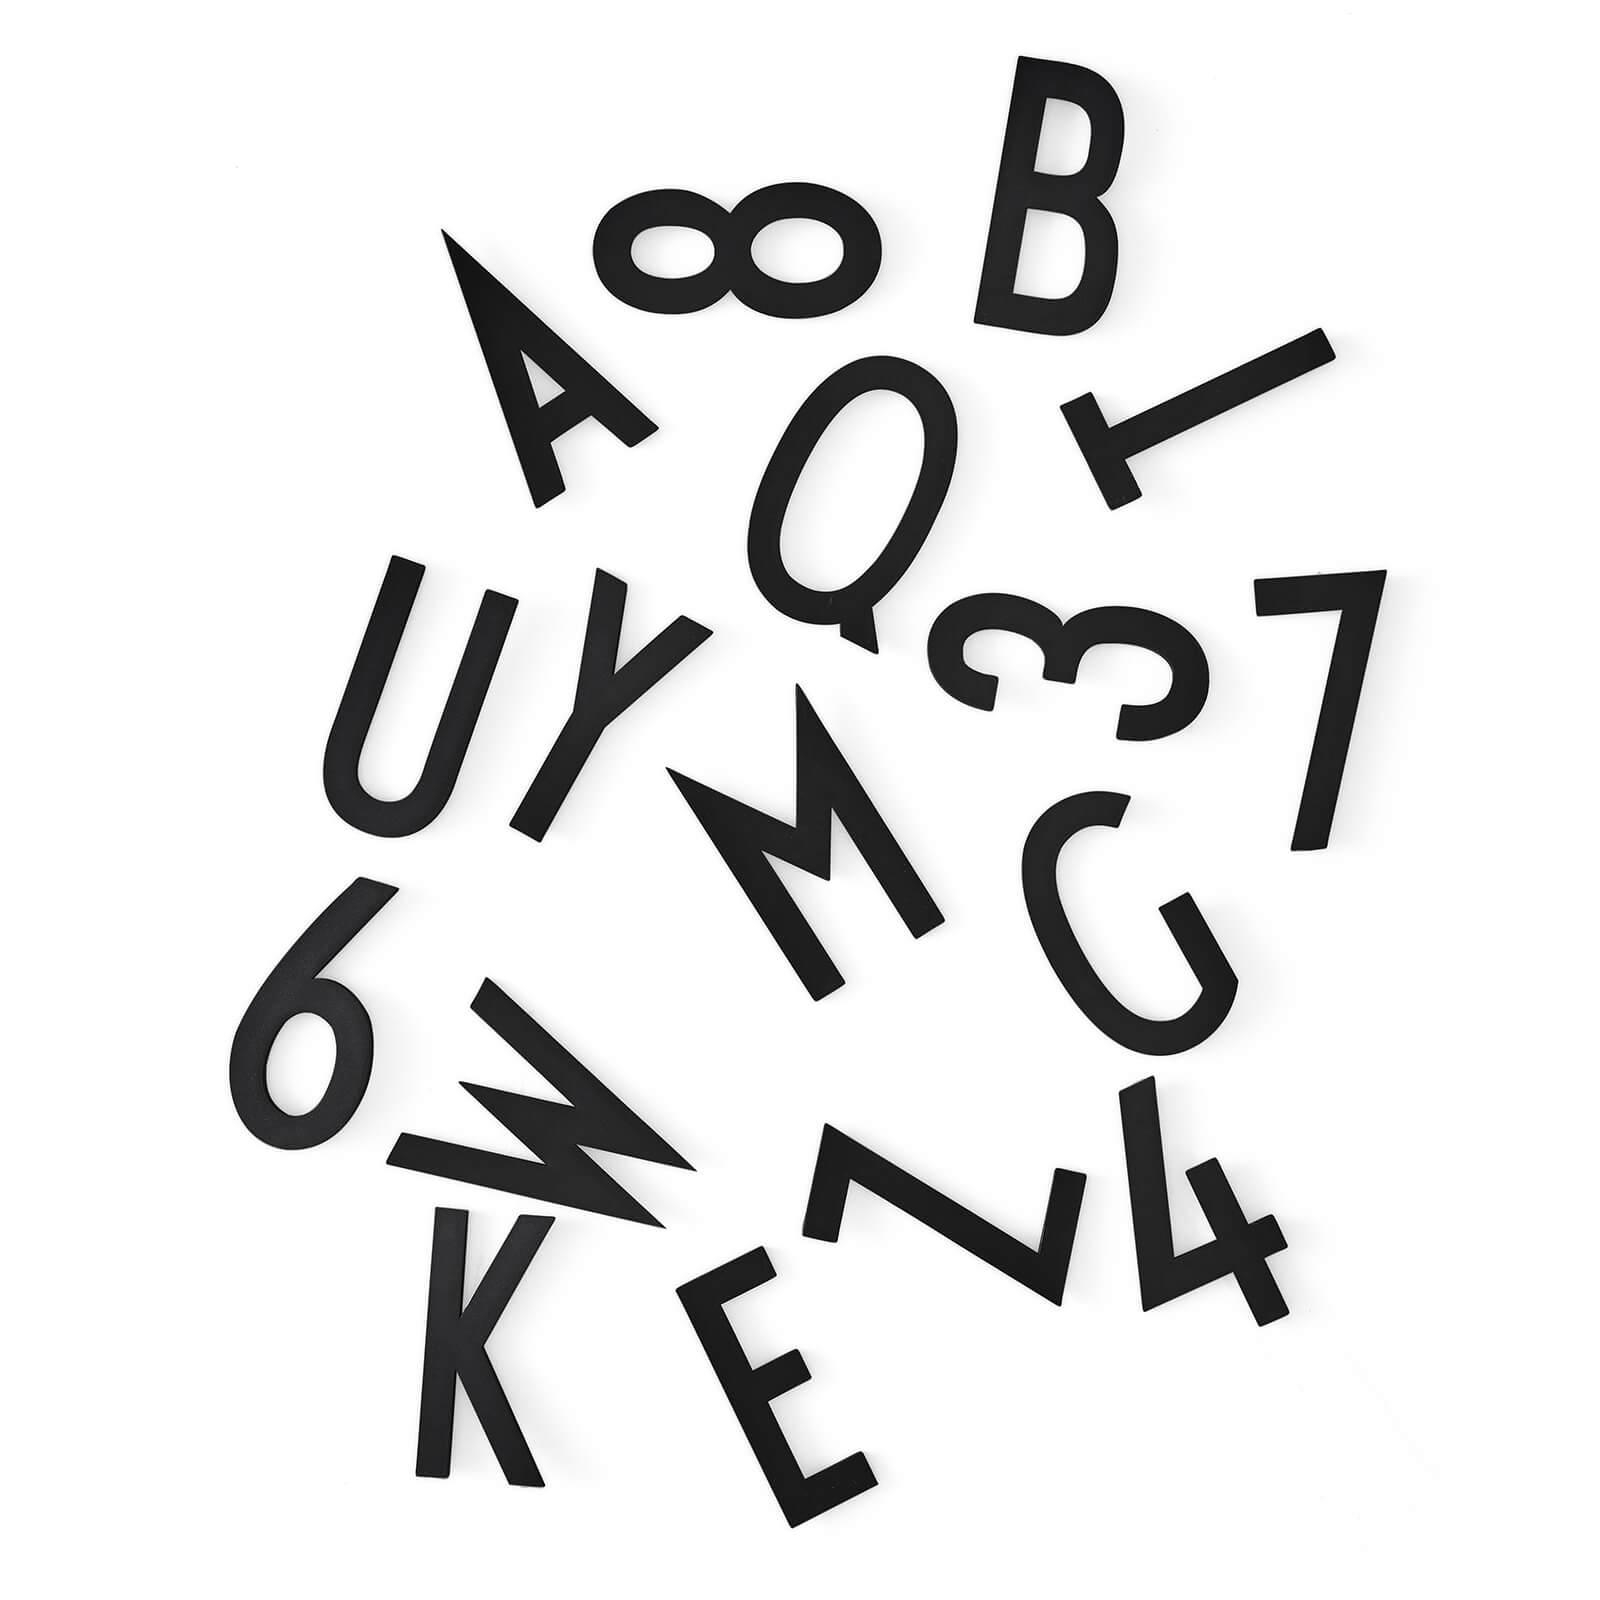 Design Letters Letterbox for Message Board - Large - Black